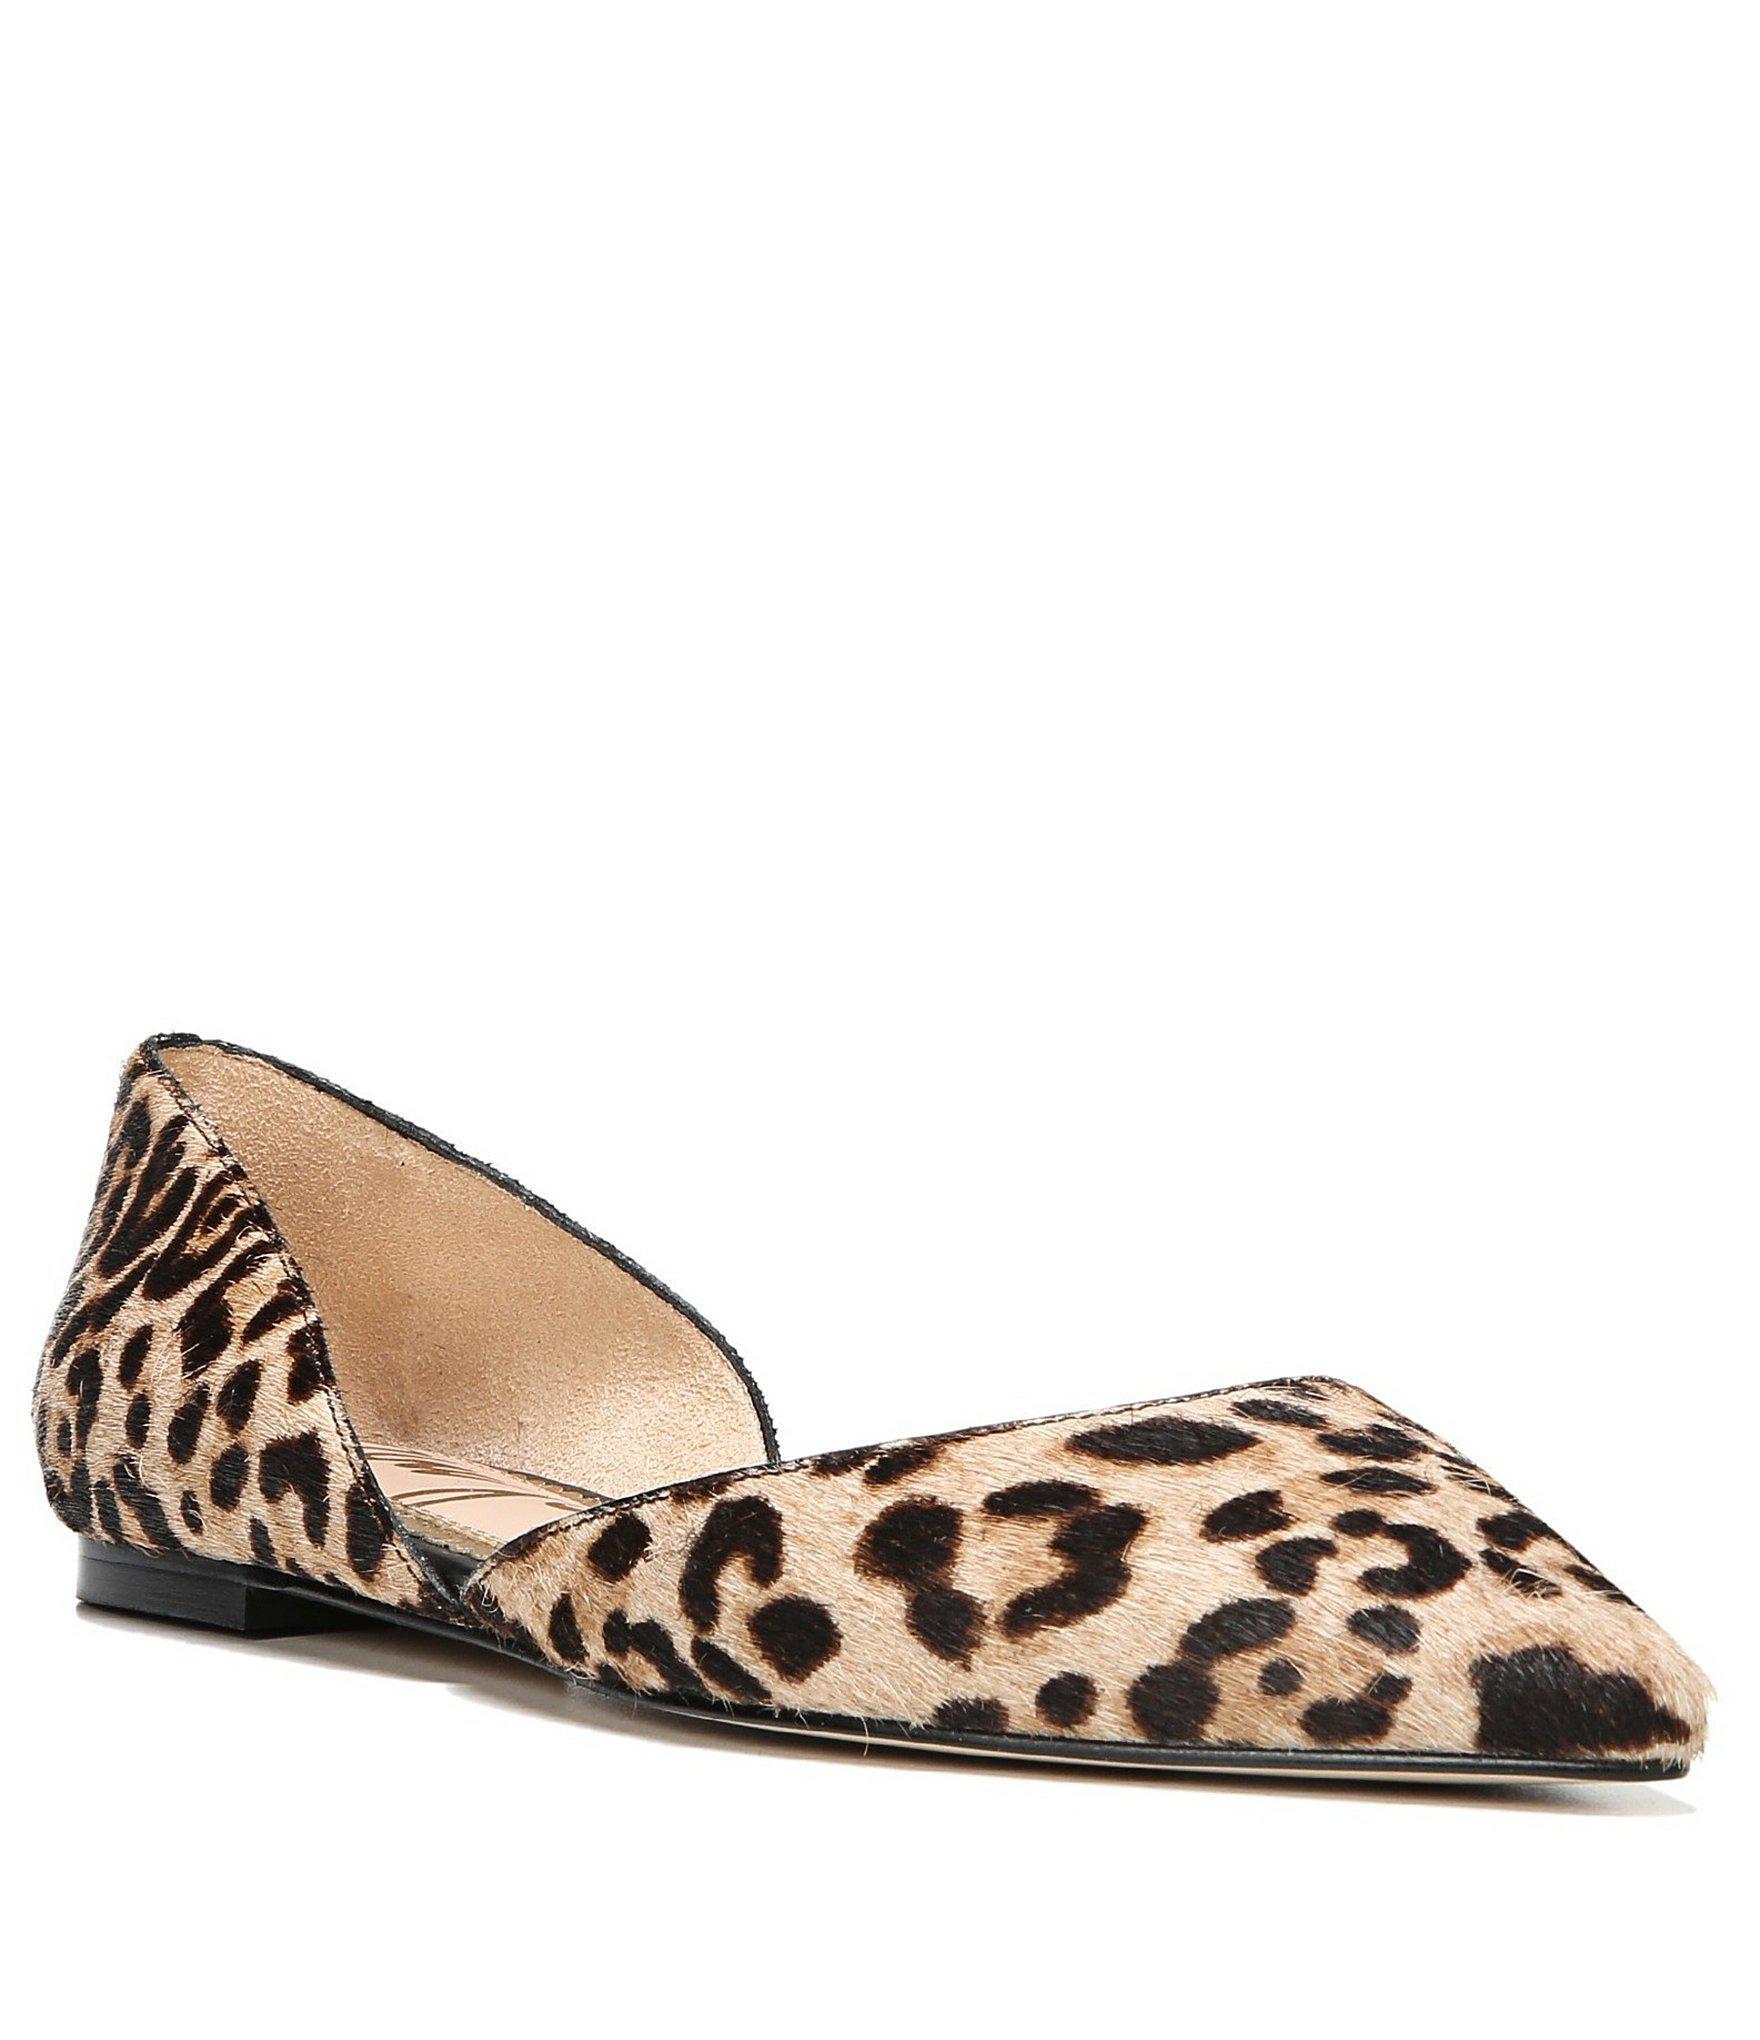 3a5465d54db8c Lyst - Sam Edelman Rodney Leopard Print Calf Hair Flats - Save 1%